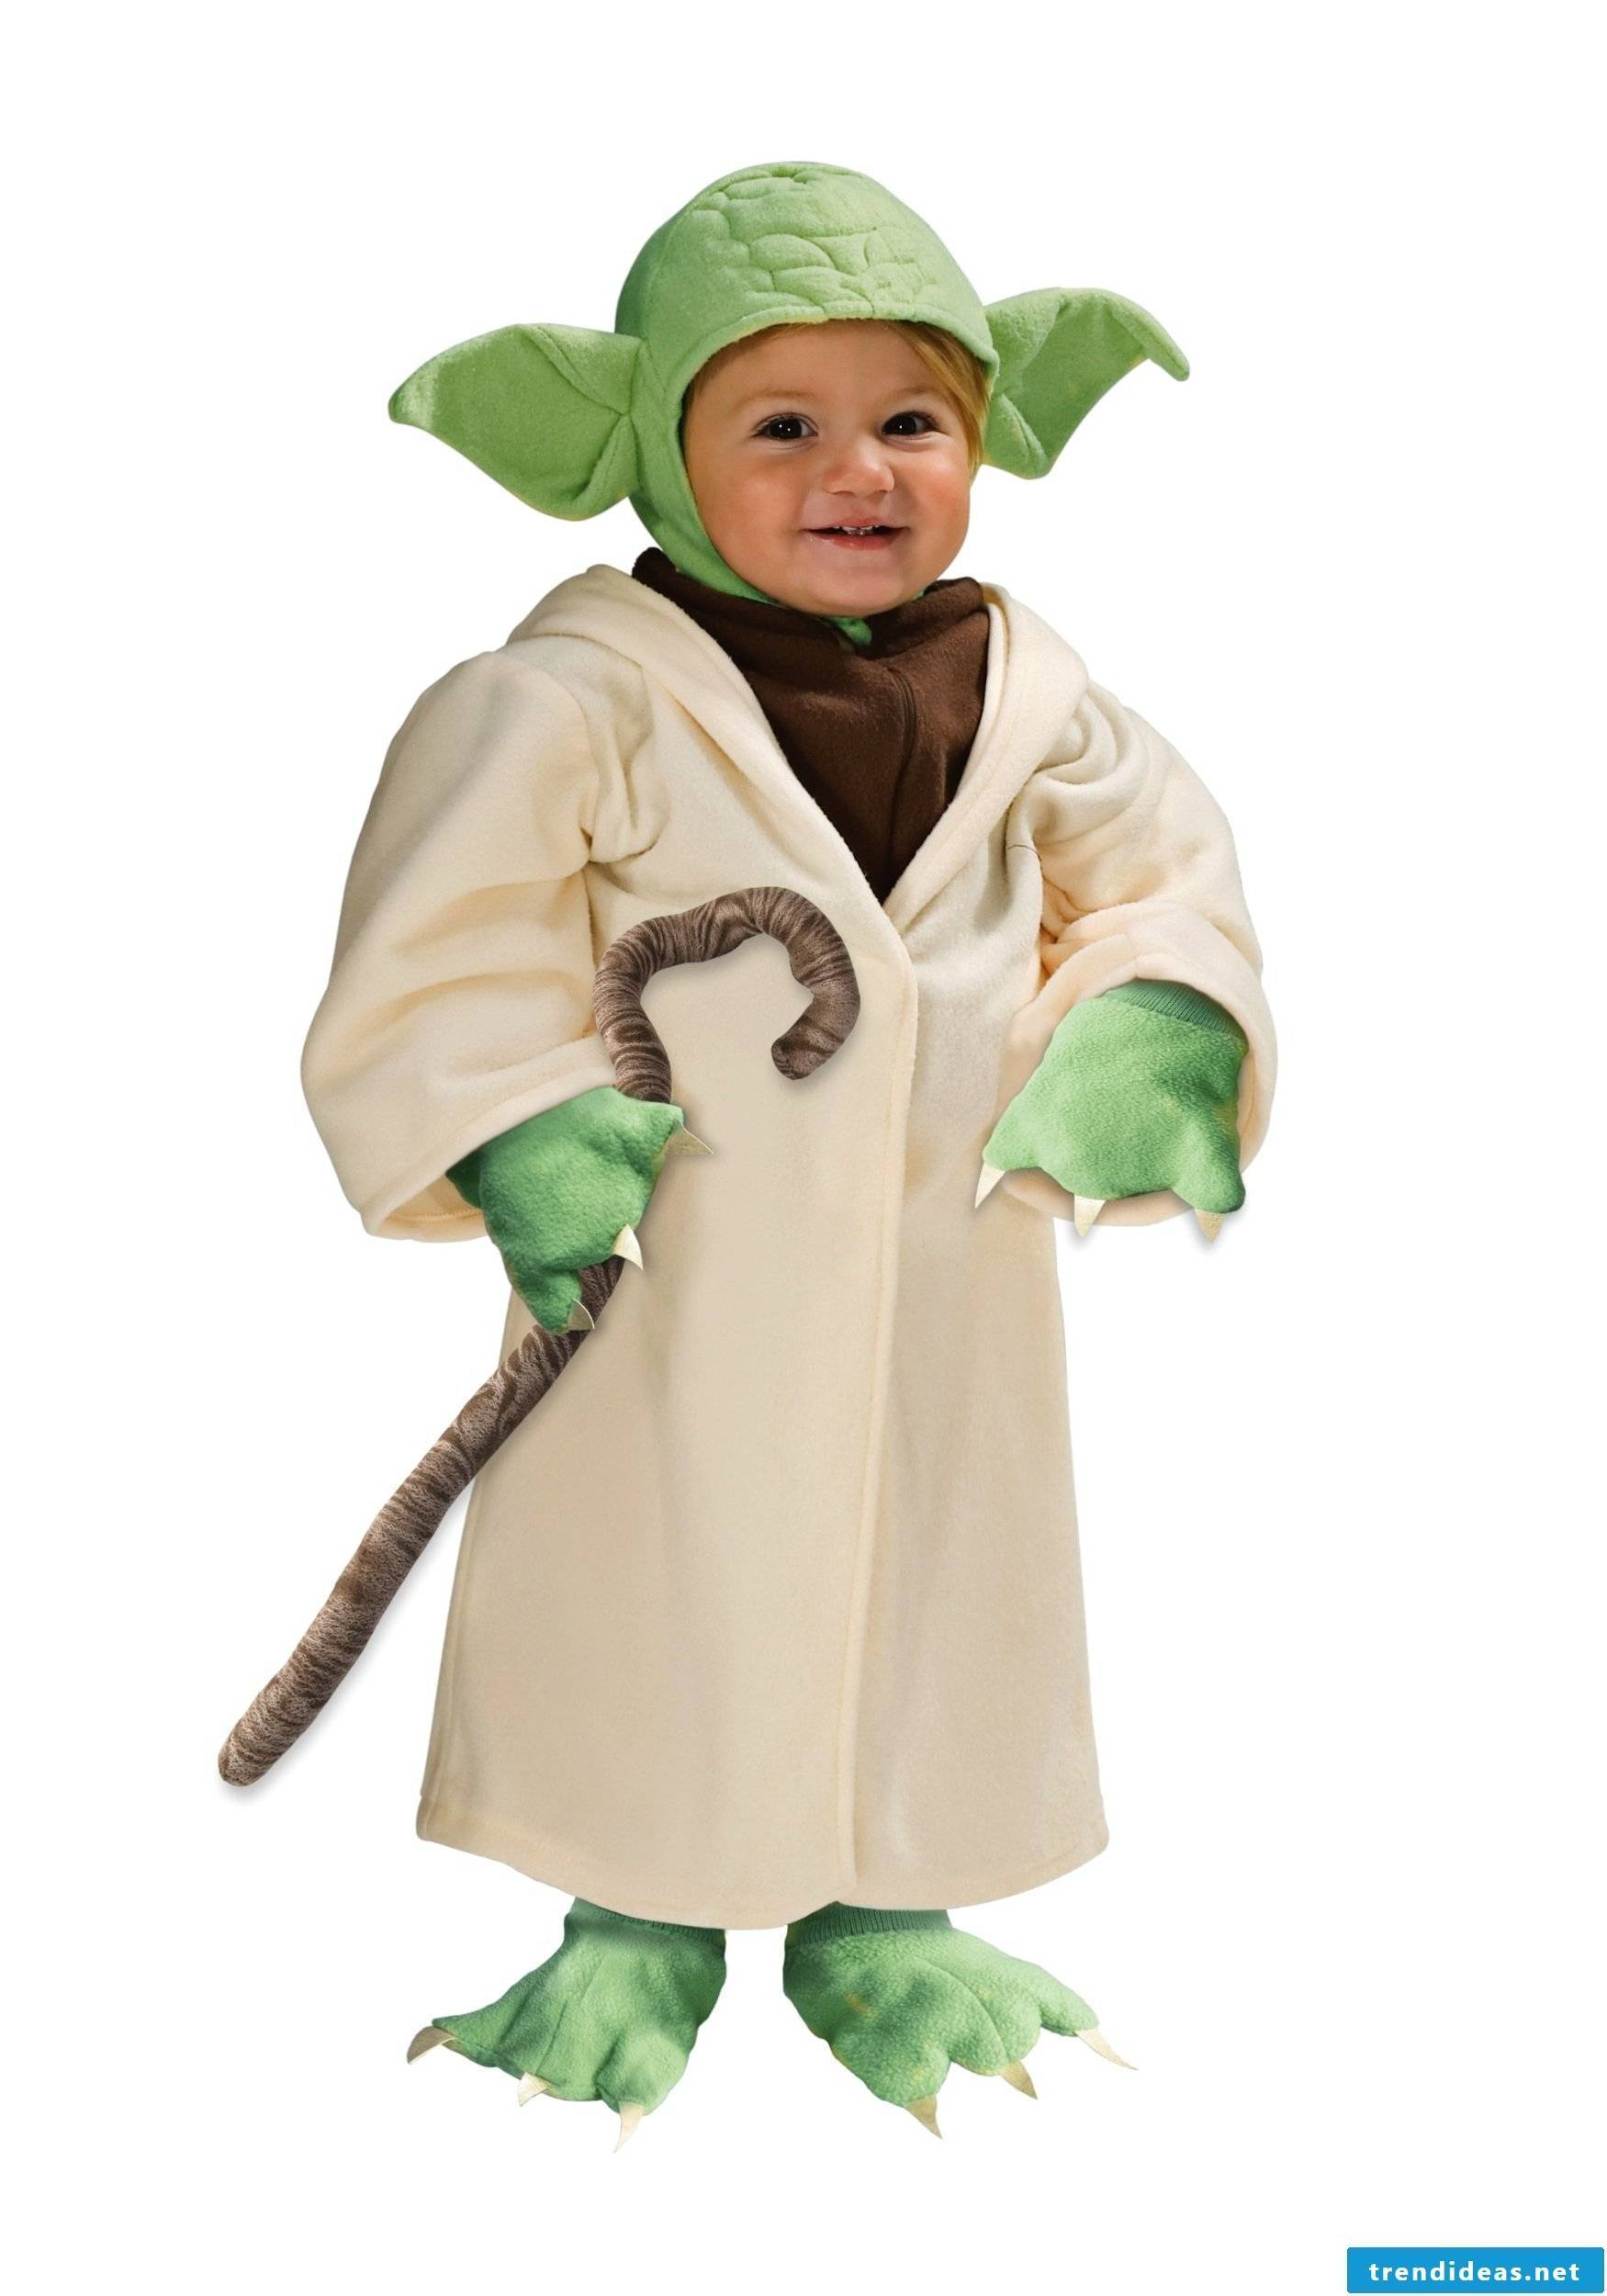 great Star Wars costume - Joda